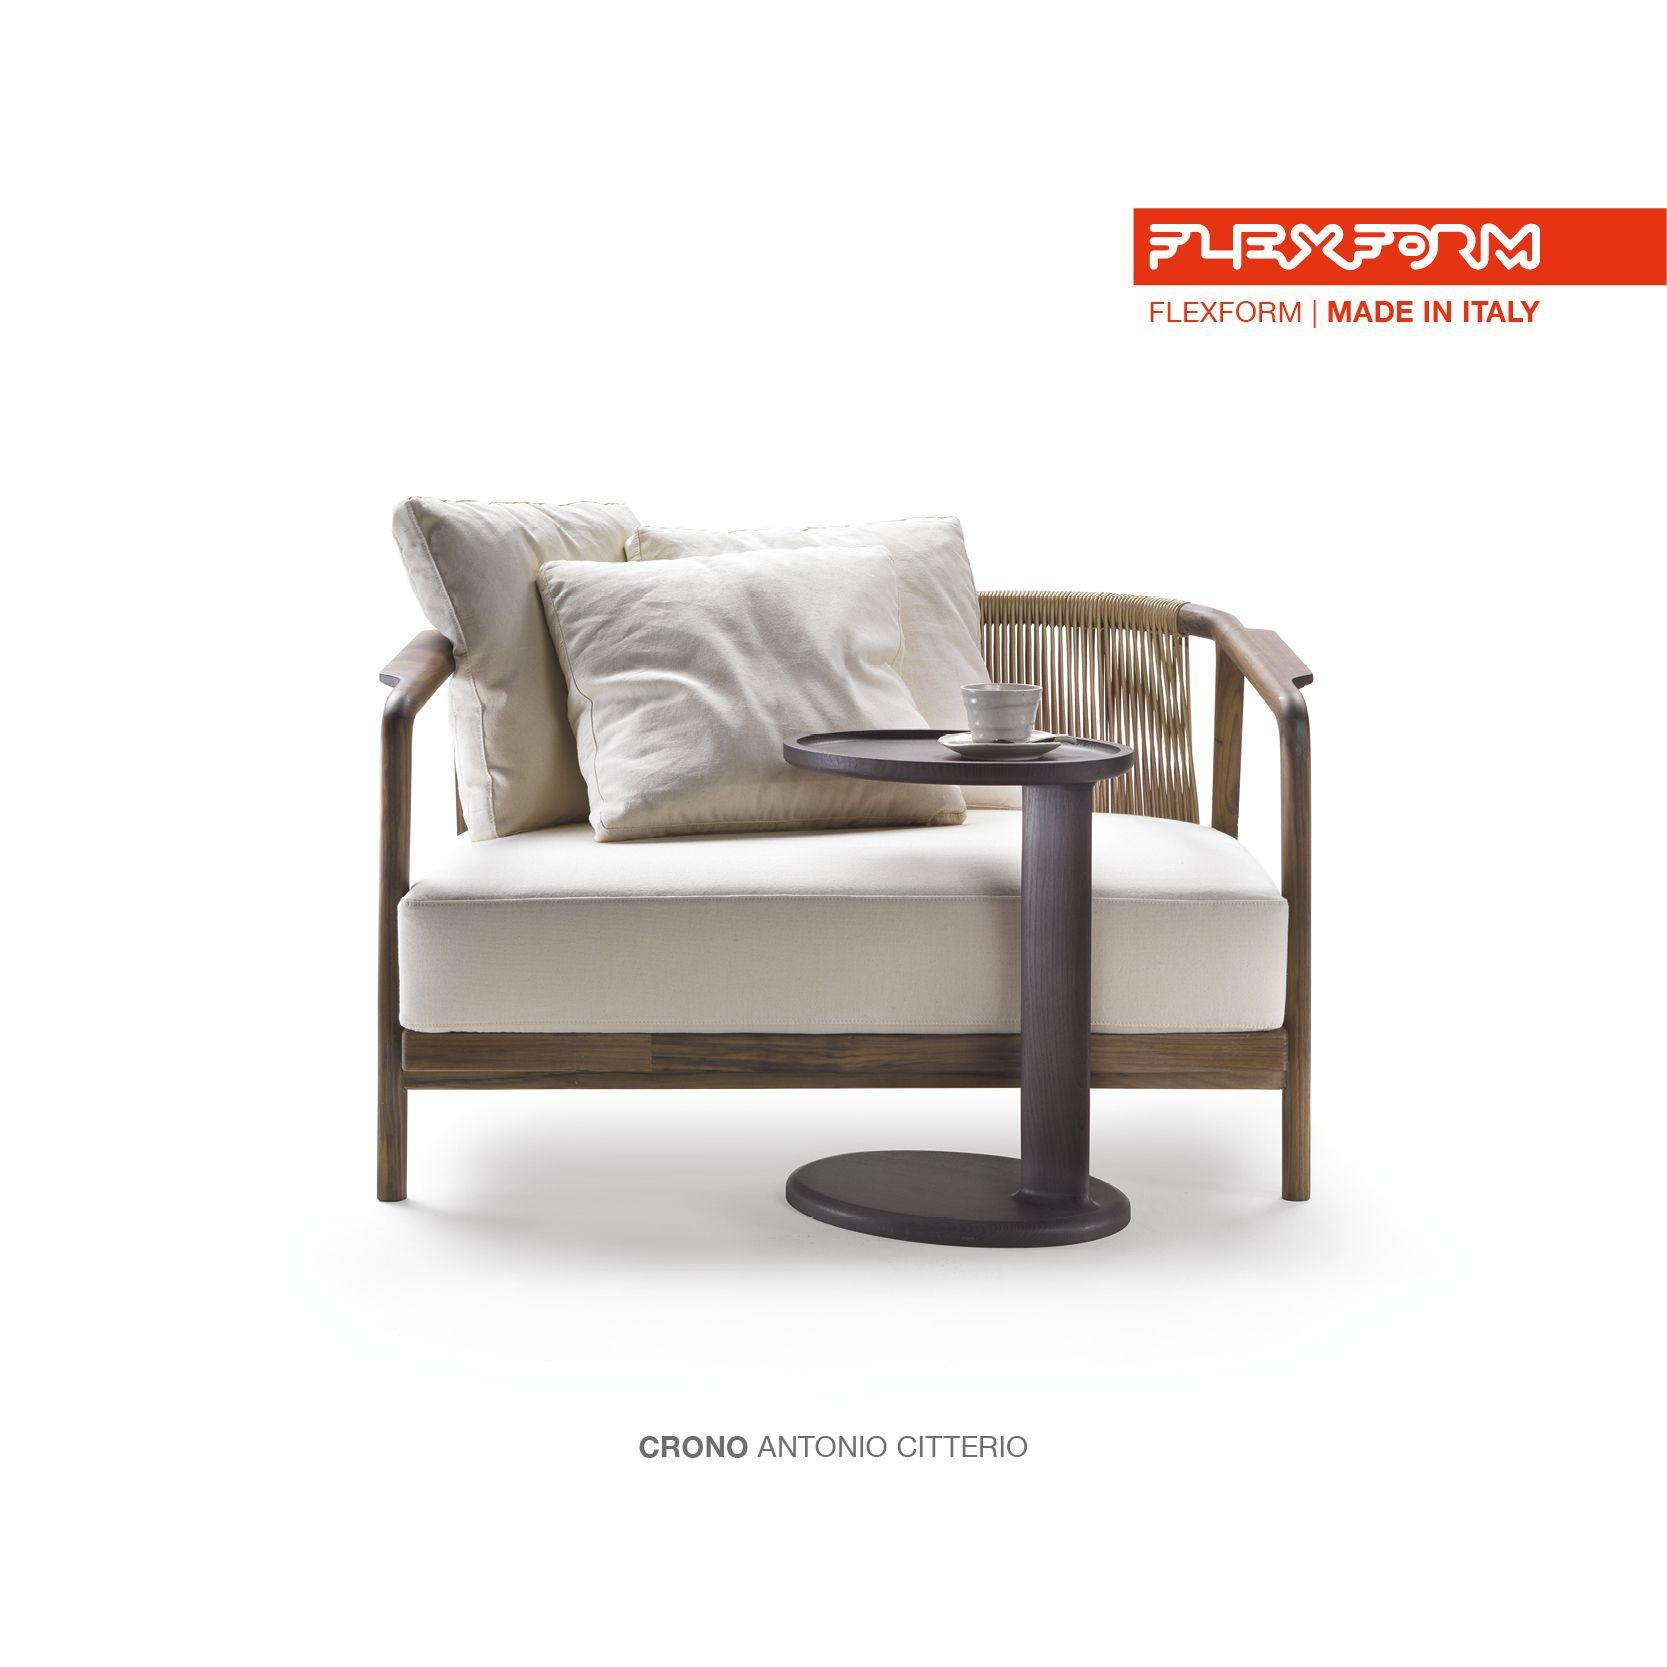 Small Sofas And Armchairs Paletten Sofa Polster Kaufen Flexform Crono Design Antonio Citterio